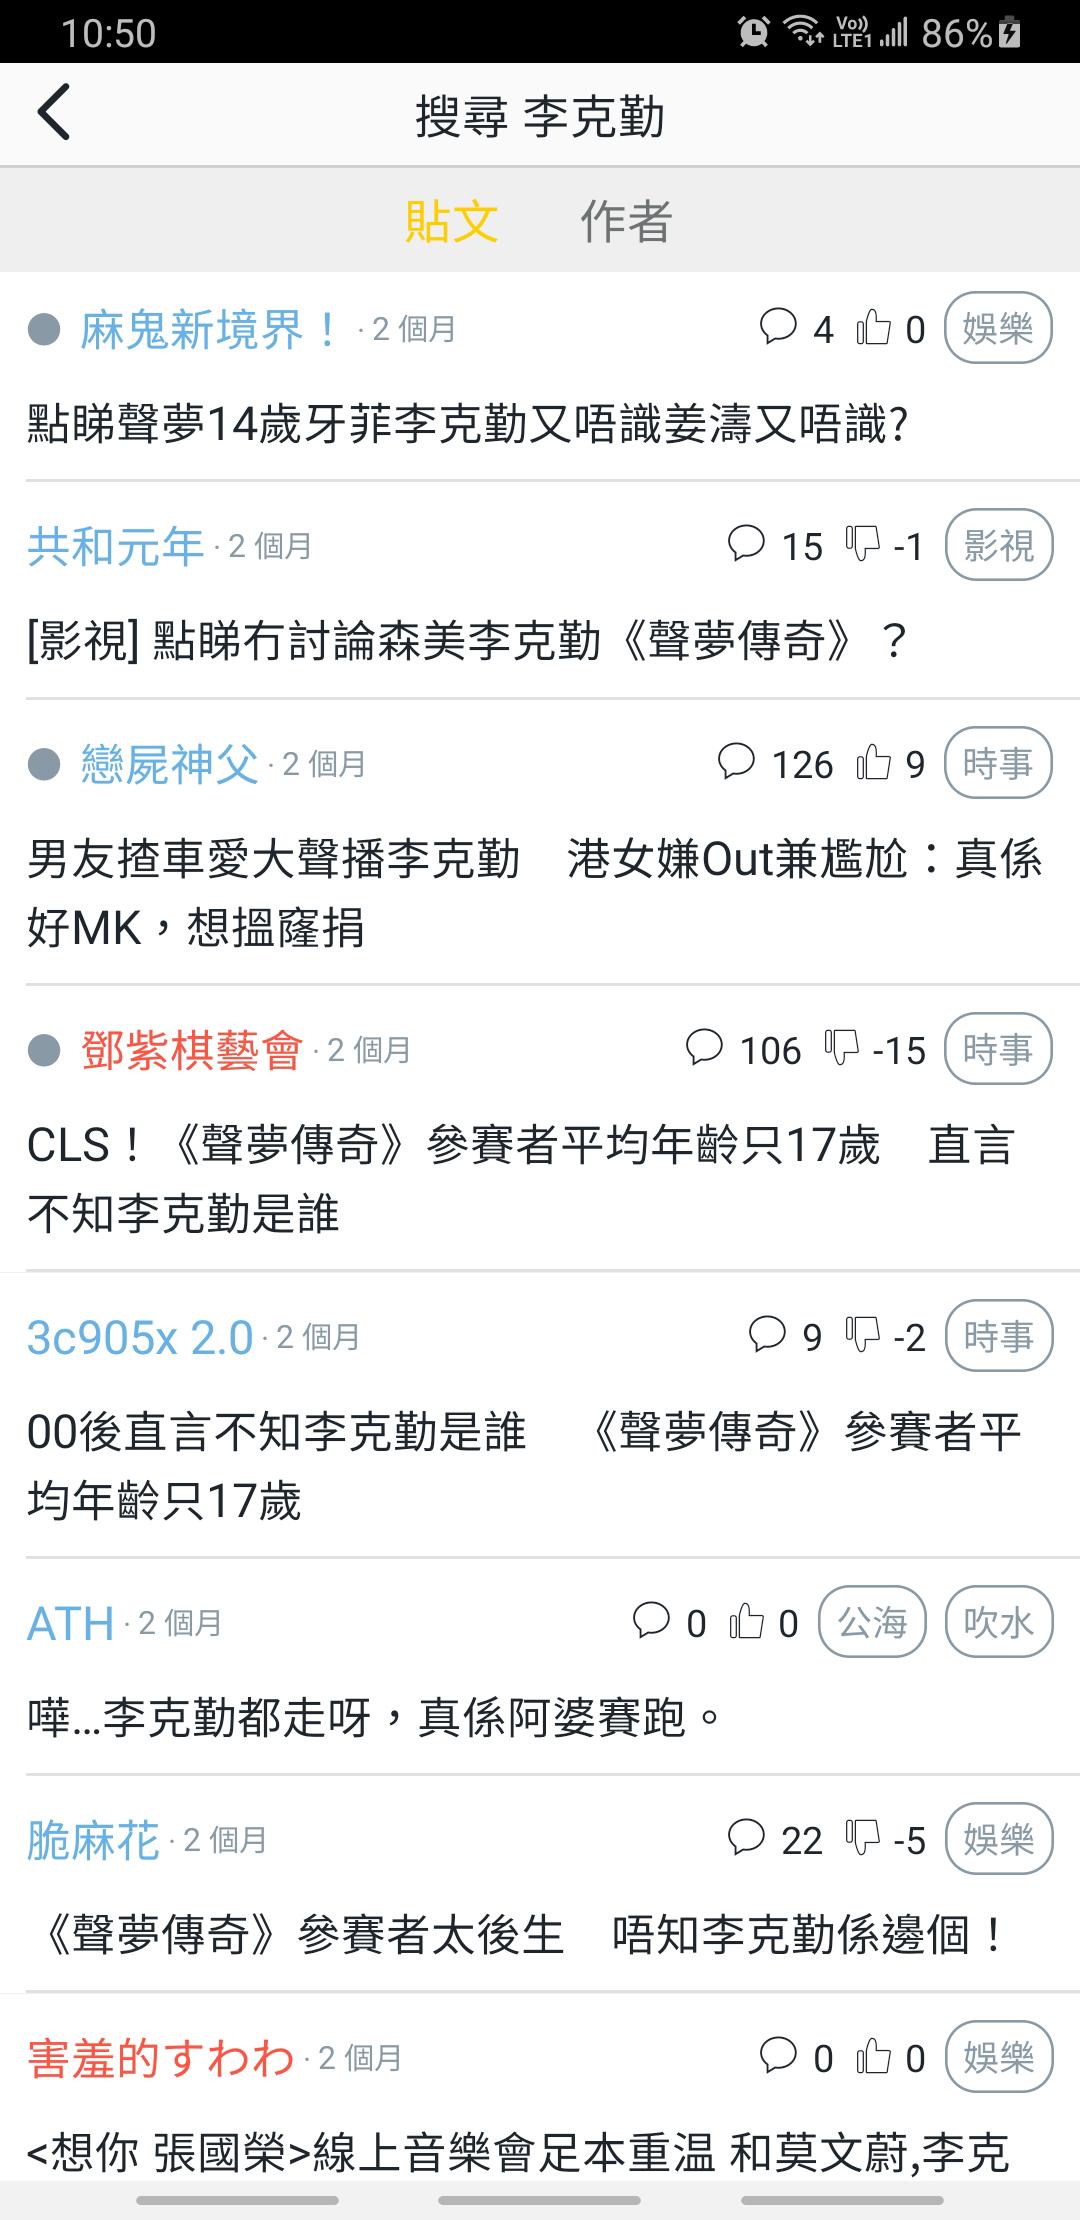 https://upload.hkgolden.media/comment/kqtae2nu.wmt0dbagpsg.cfxkn2ftq1j.4qb.jpg